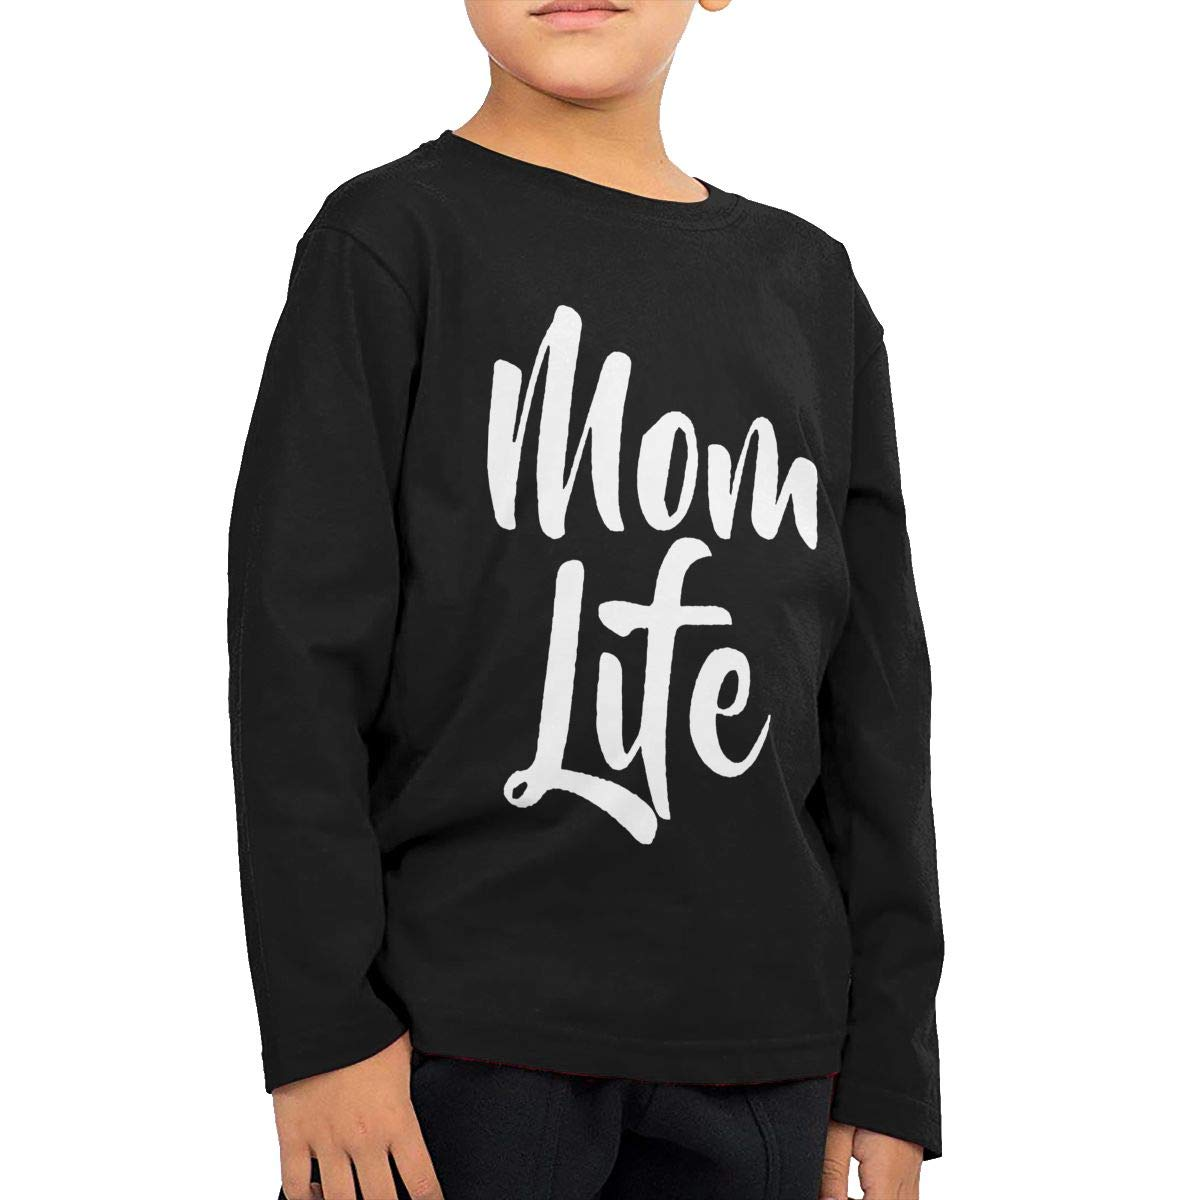 WCHUNMU Mom Life Childrens Cotton Black Long Sleeve Round Neck Boys Or Girls Tee Shirt